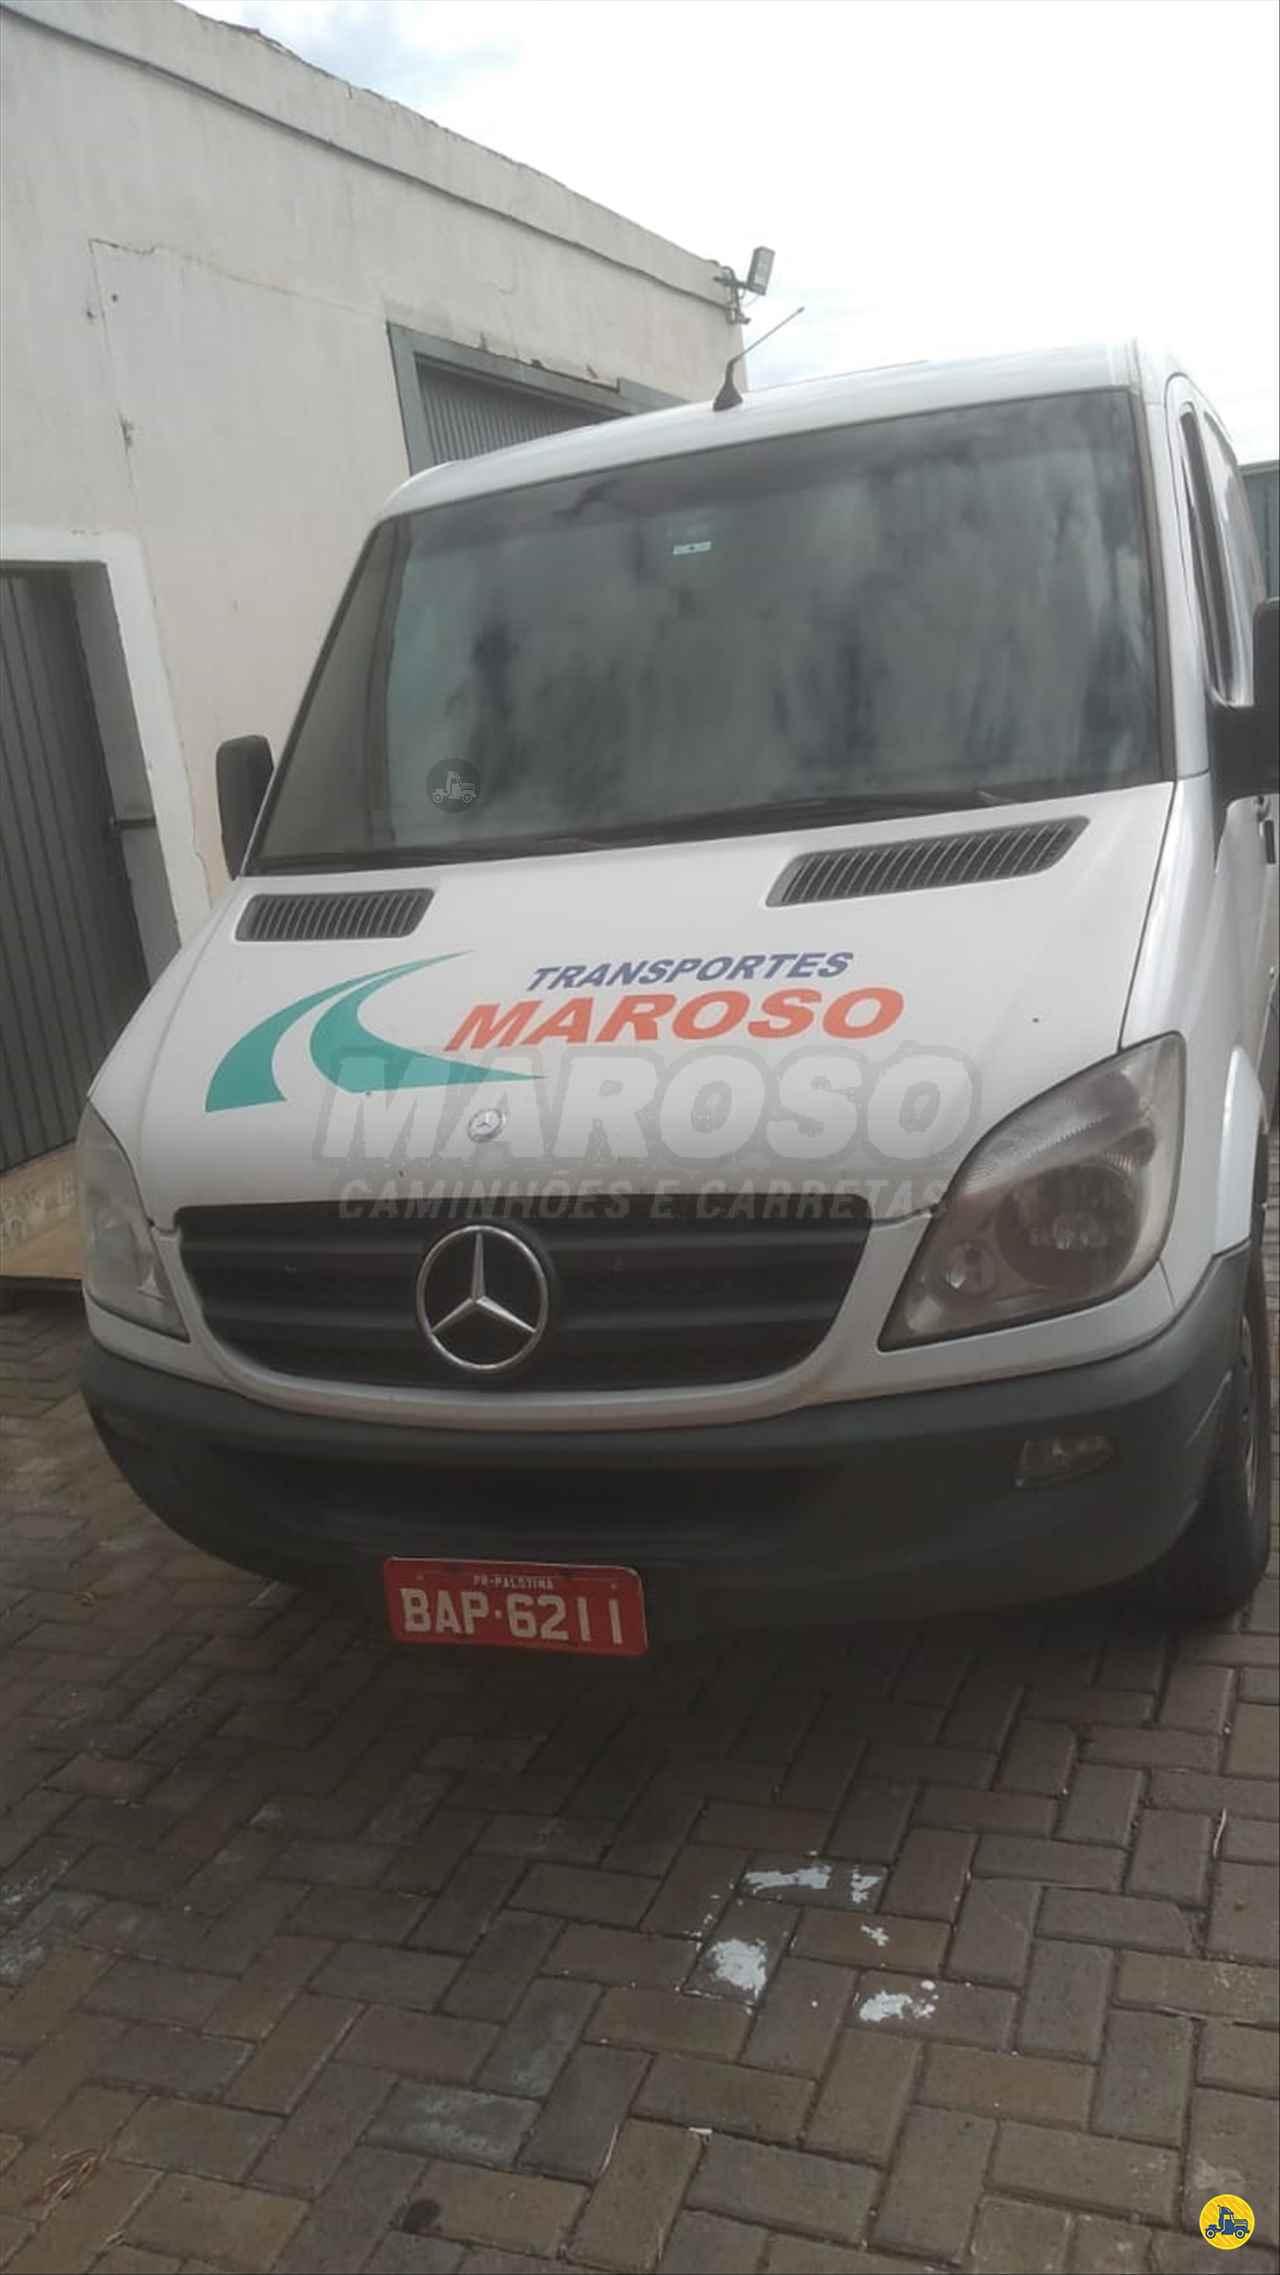 VANS MERCEDES-BENZ Sprinter VAN 415 Maroso Caminhões PALOTINA PARANÁ PR